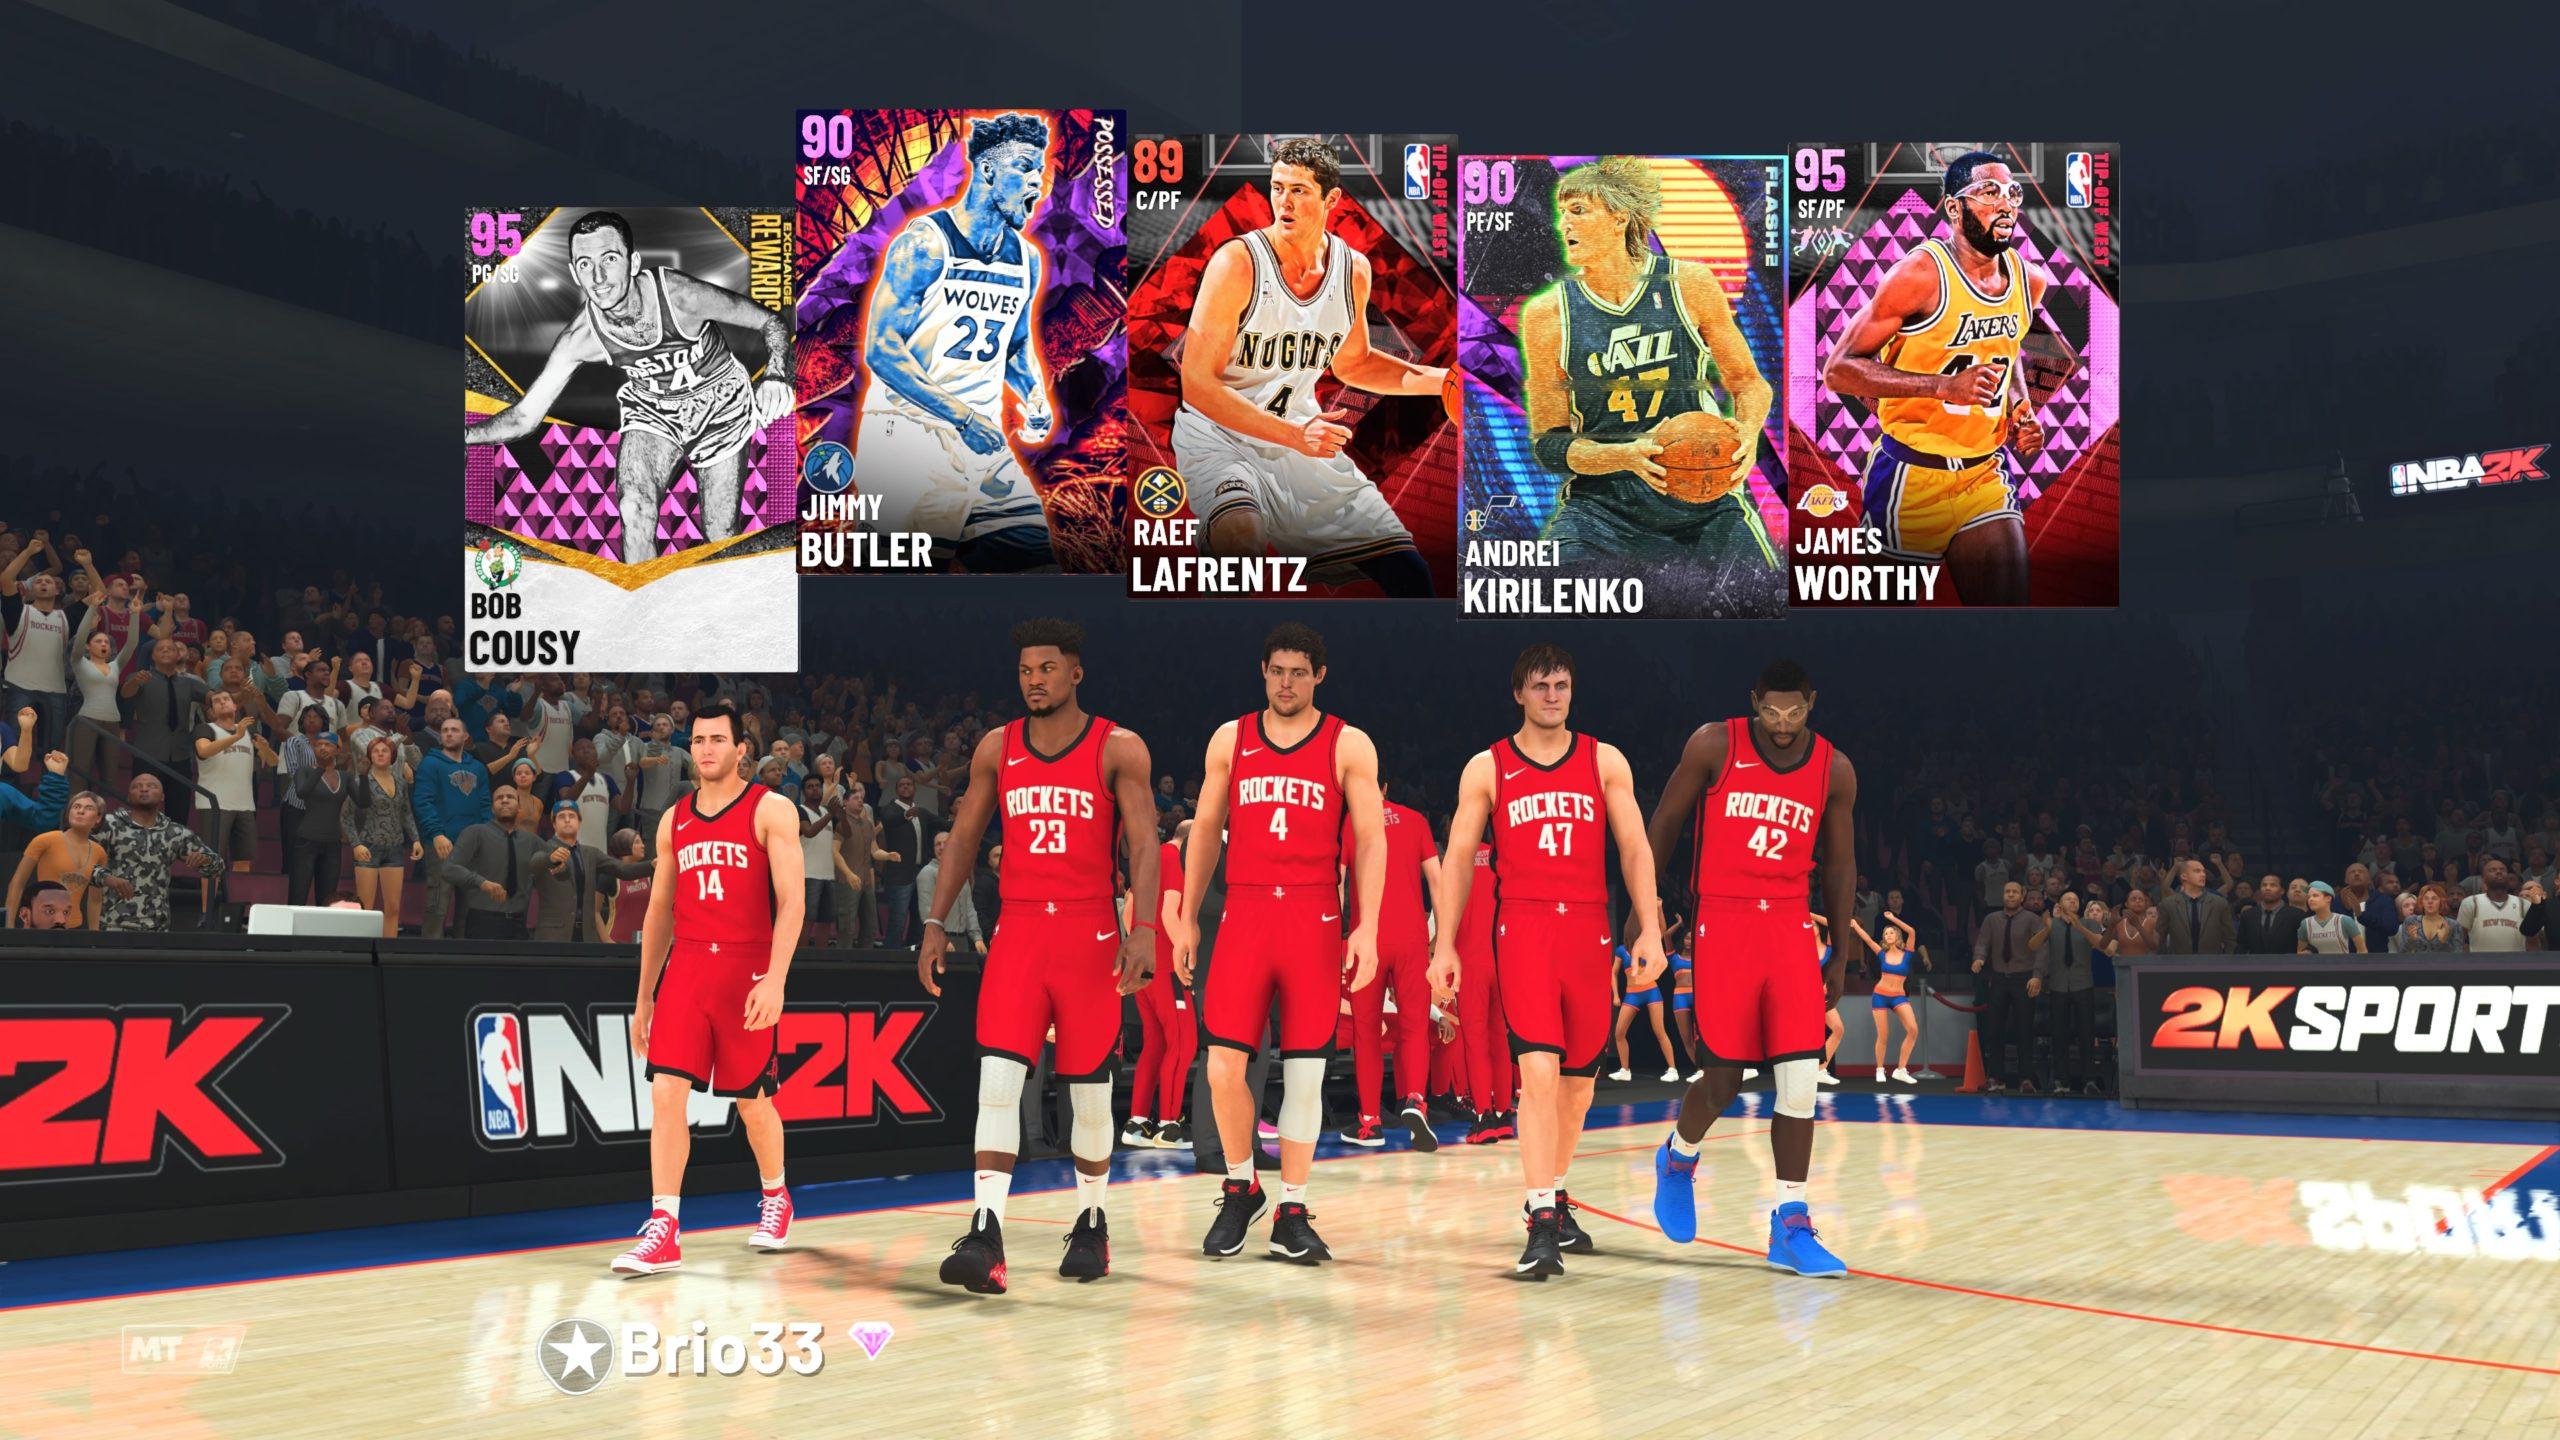 NBA 2K21 Next-Gen MyTeam